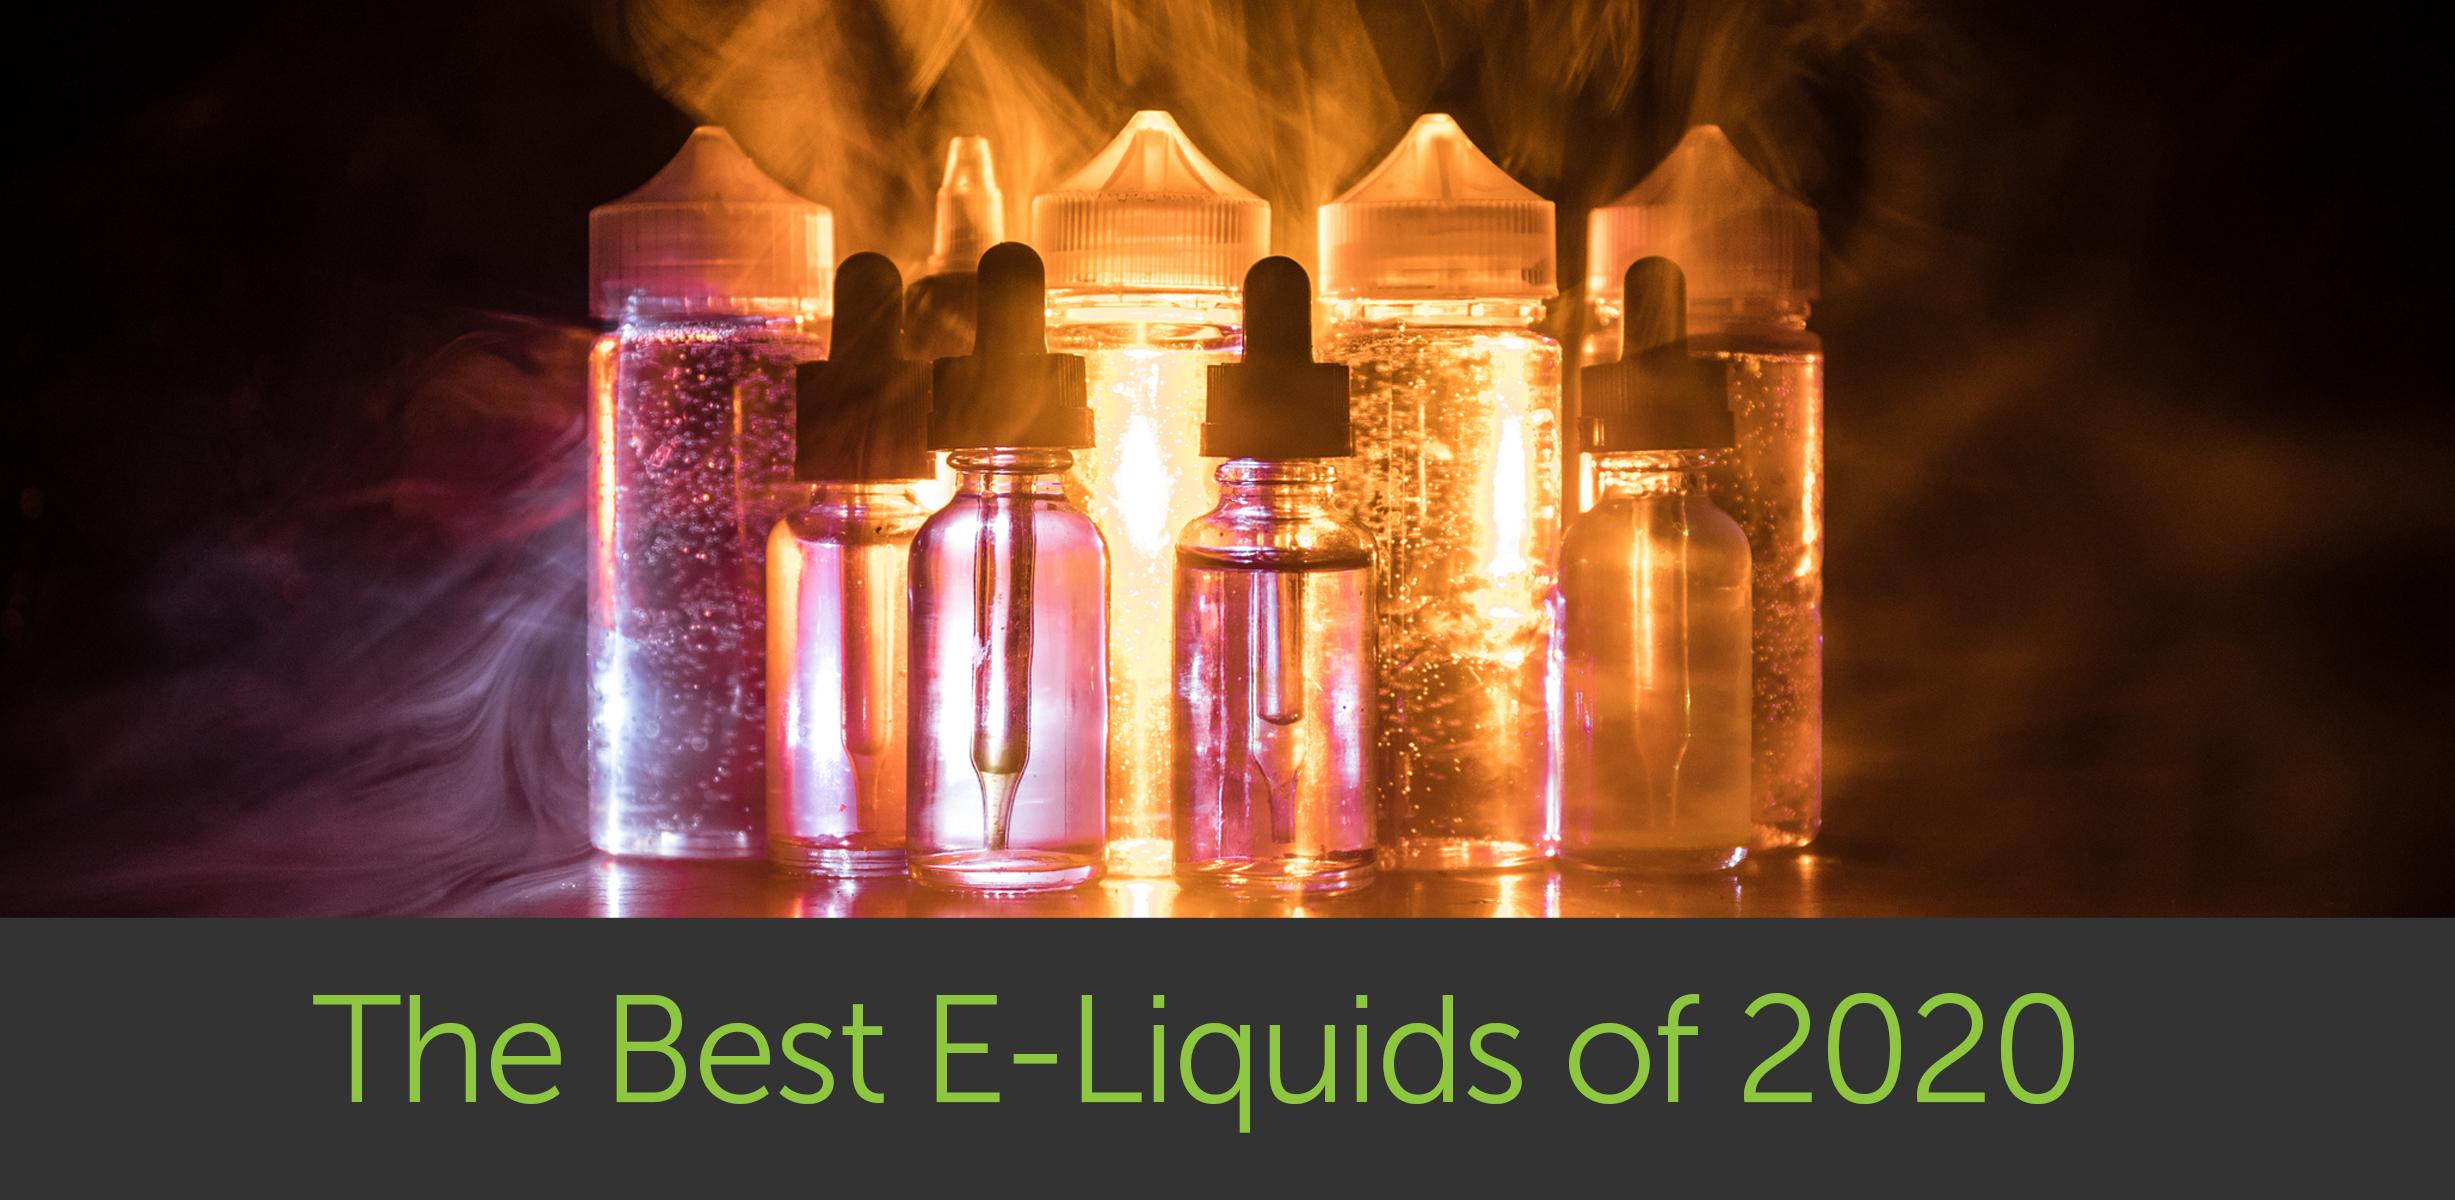 The Best E-liquids of 2020